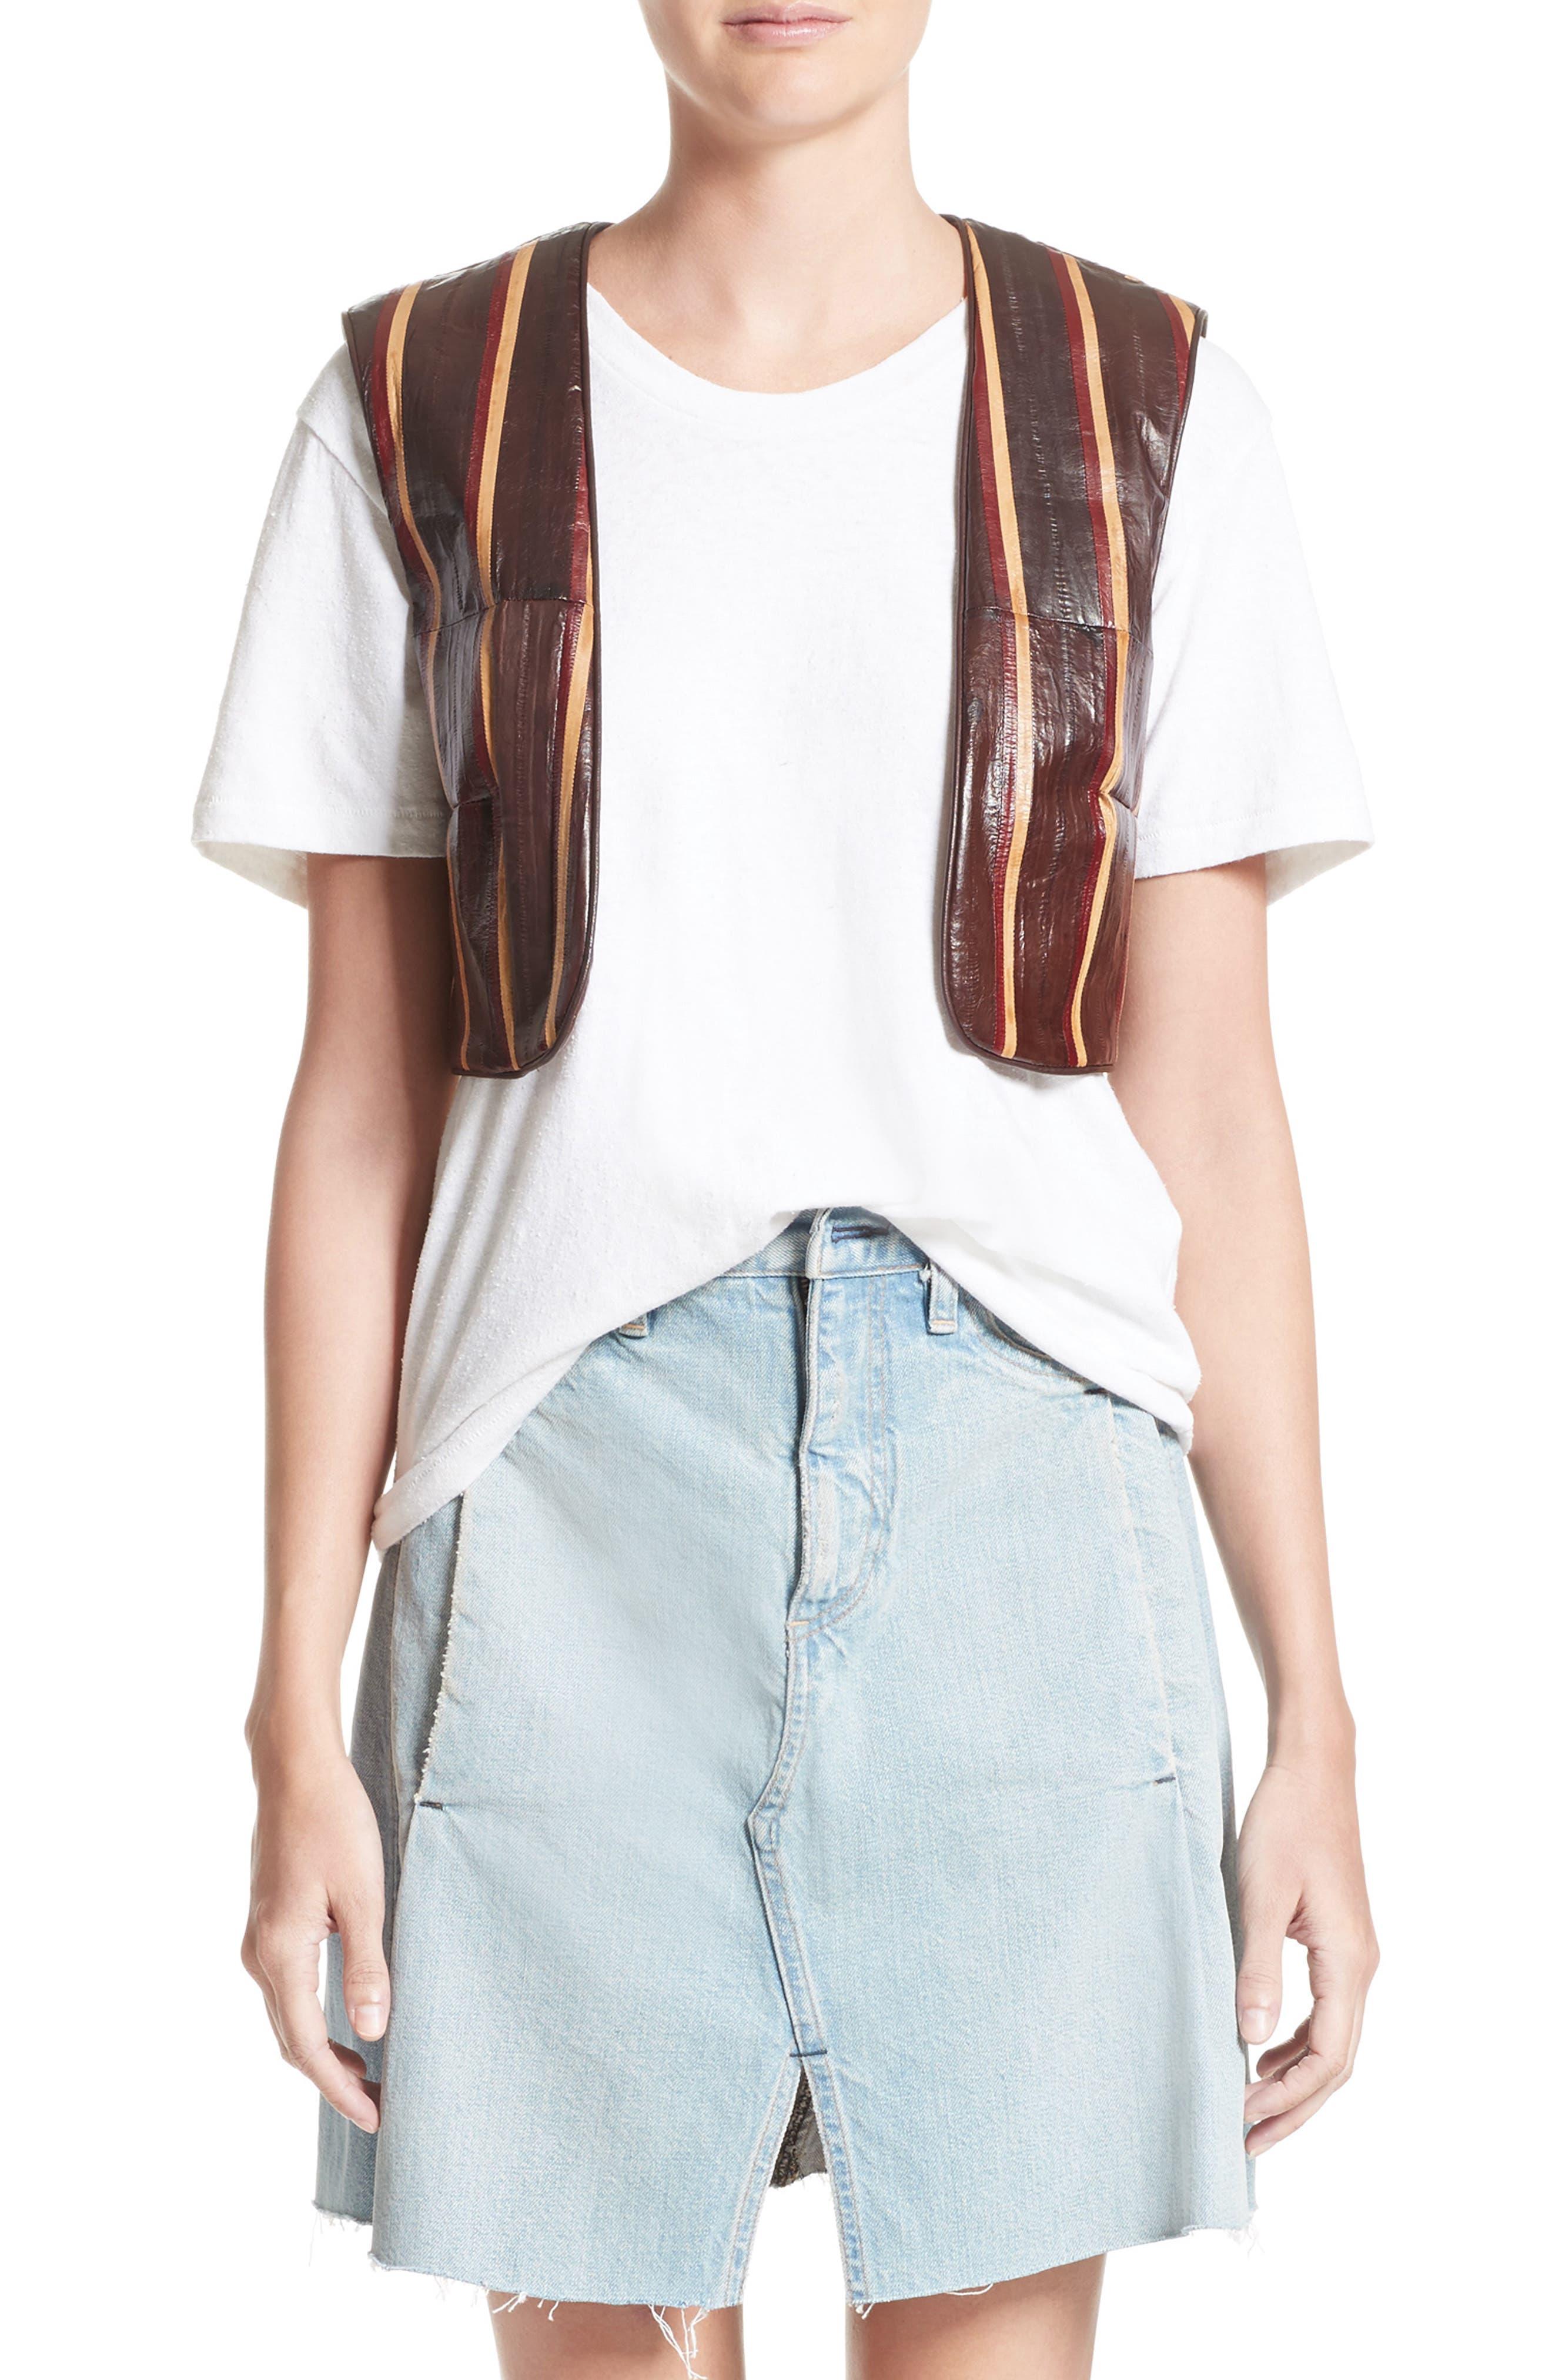 Main Image - Simon Miller Striped Genuine Eelskin Vest (Nordstrom Exclusive)